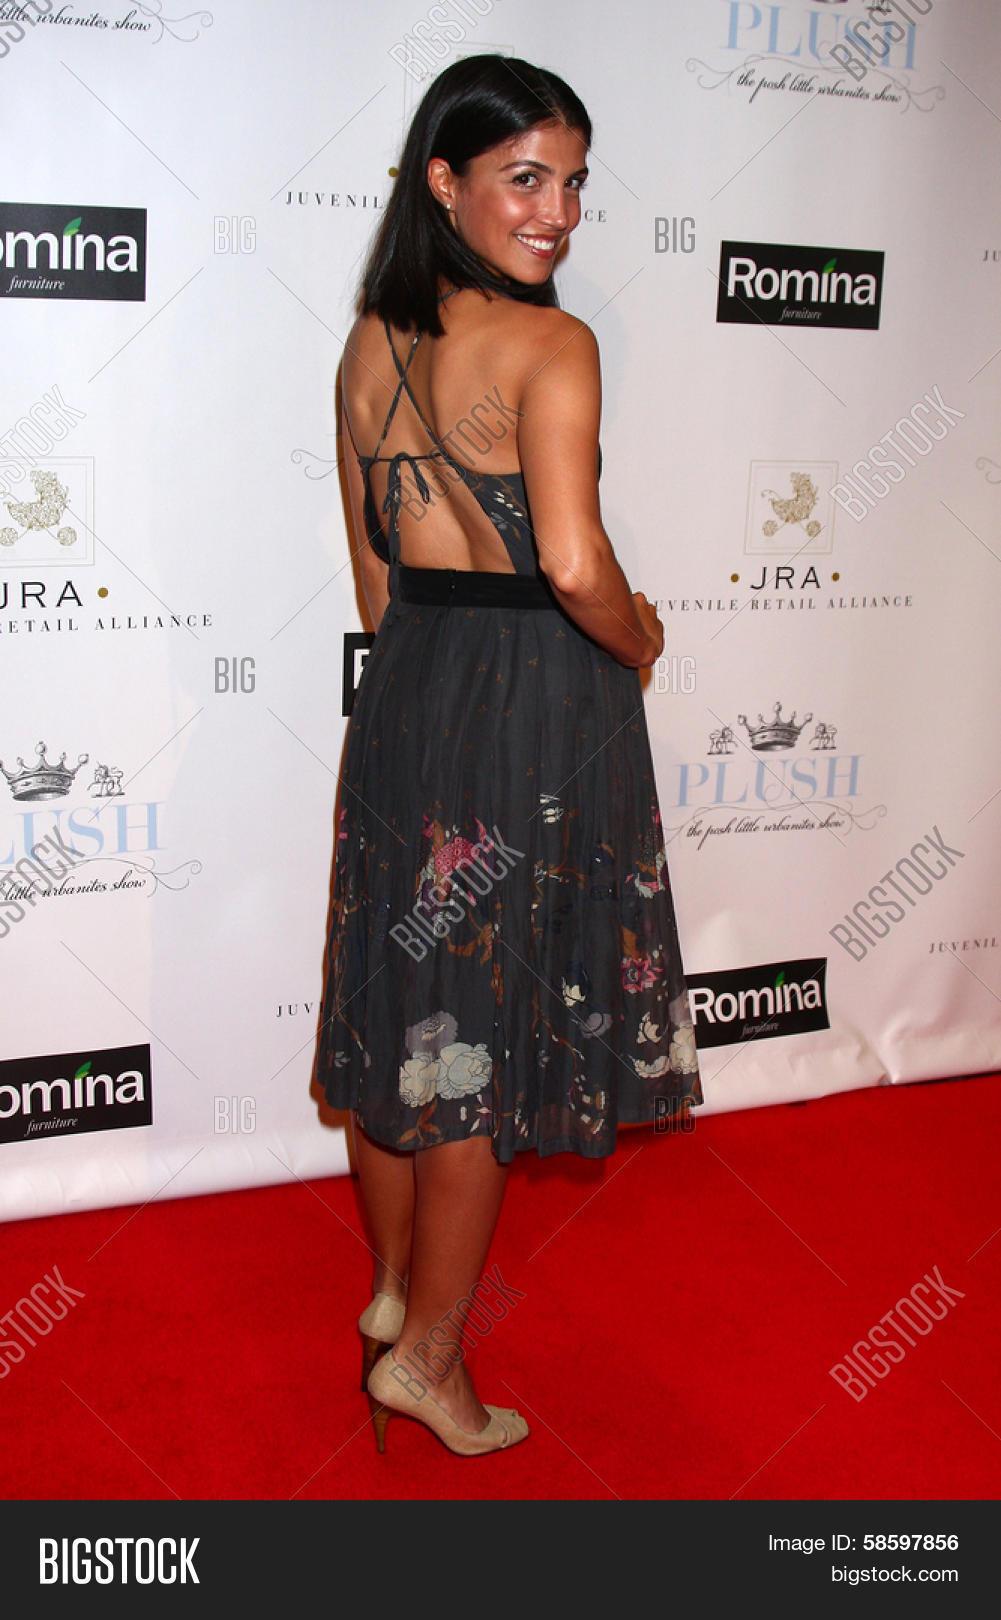 Communication on this topic: Princess Donna, katherine-heigl/